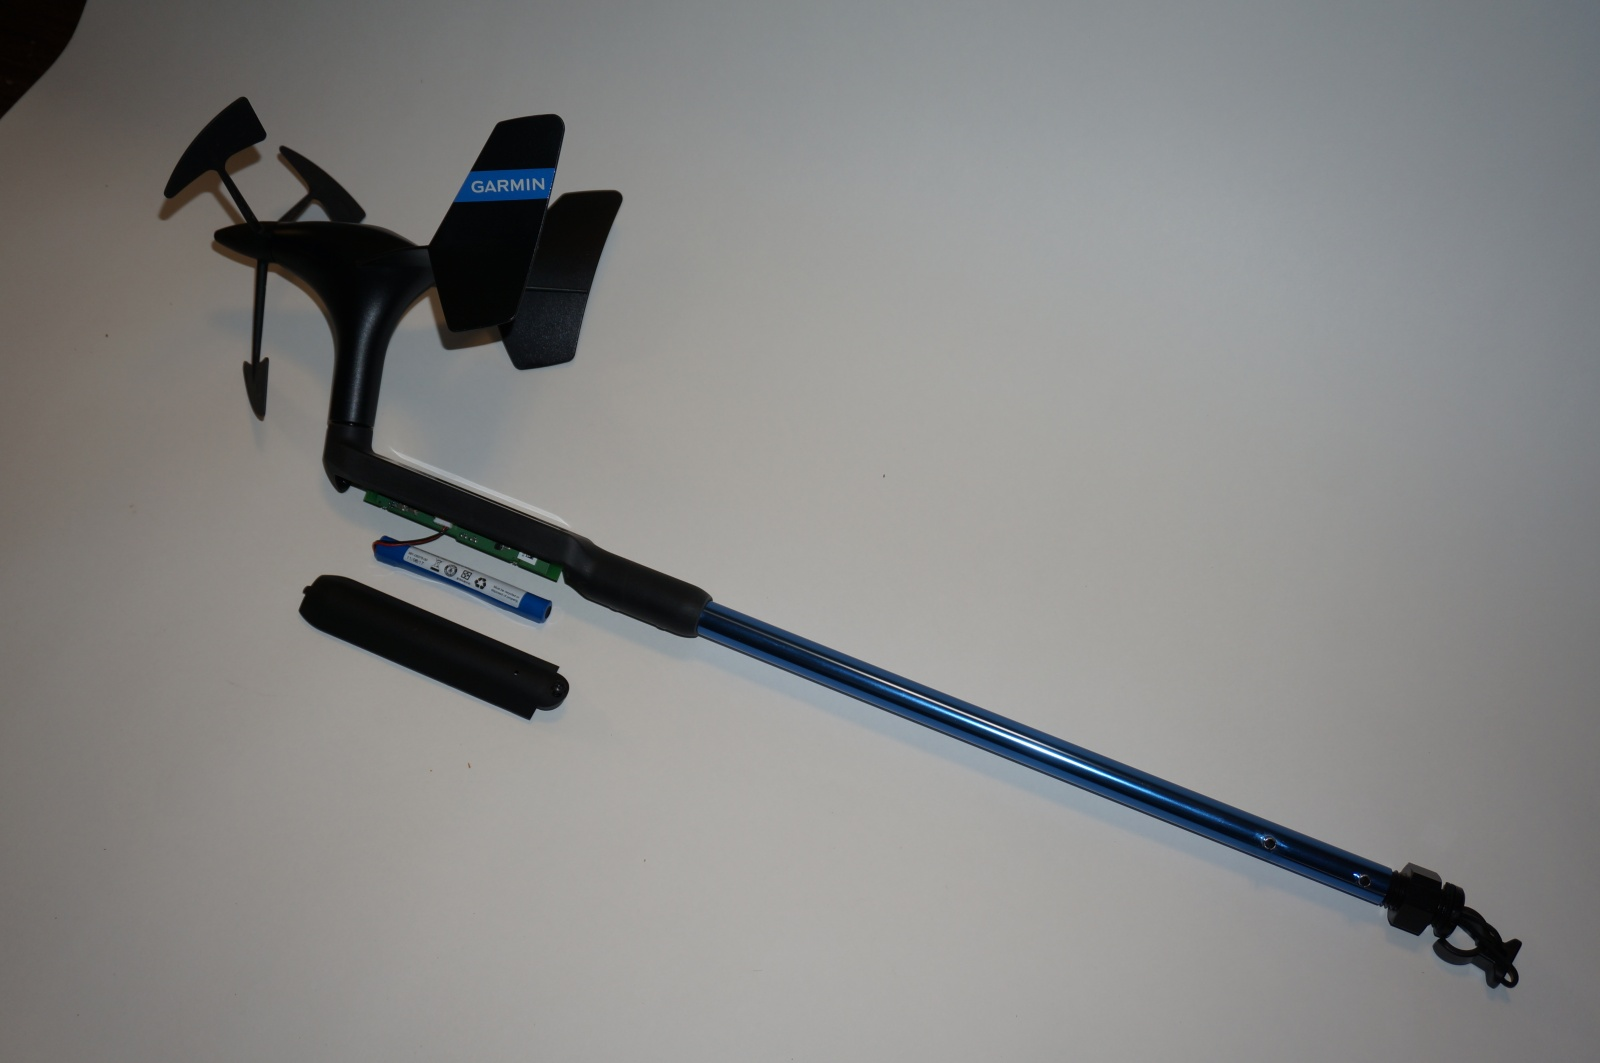 For Sale: Garmin GNX Wireless Wind Pack (Garmin p/n: 010